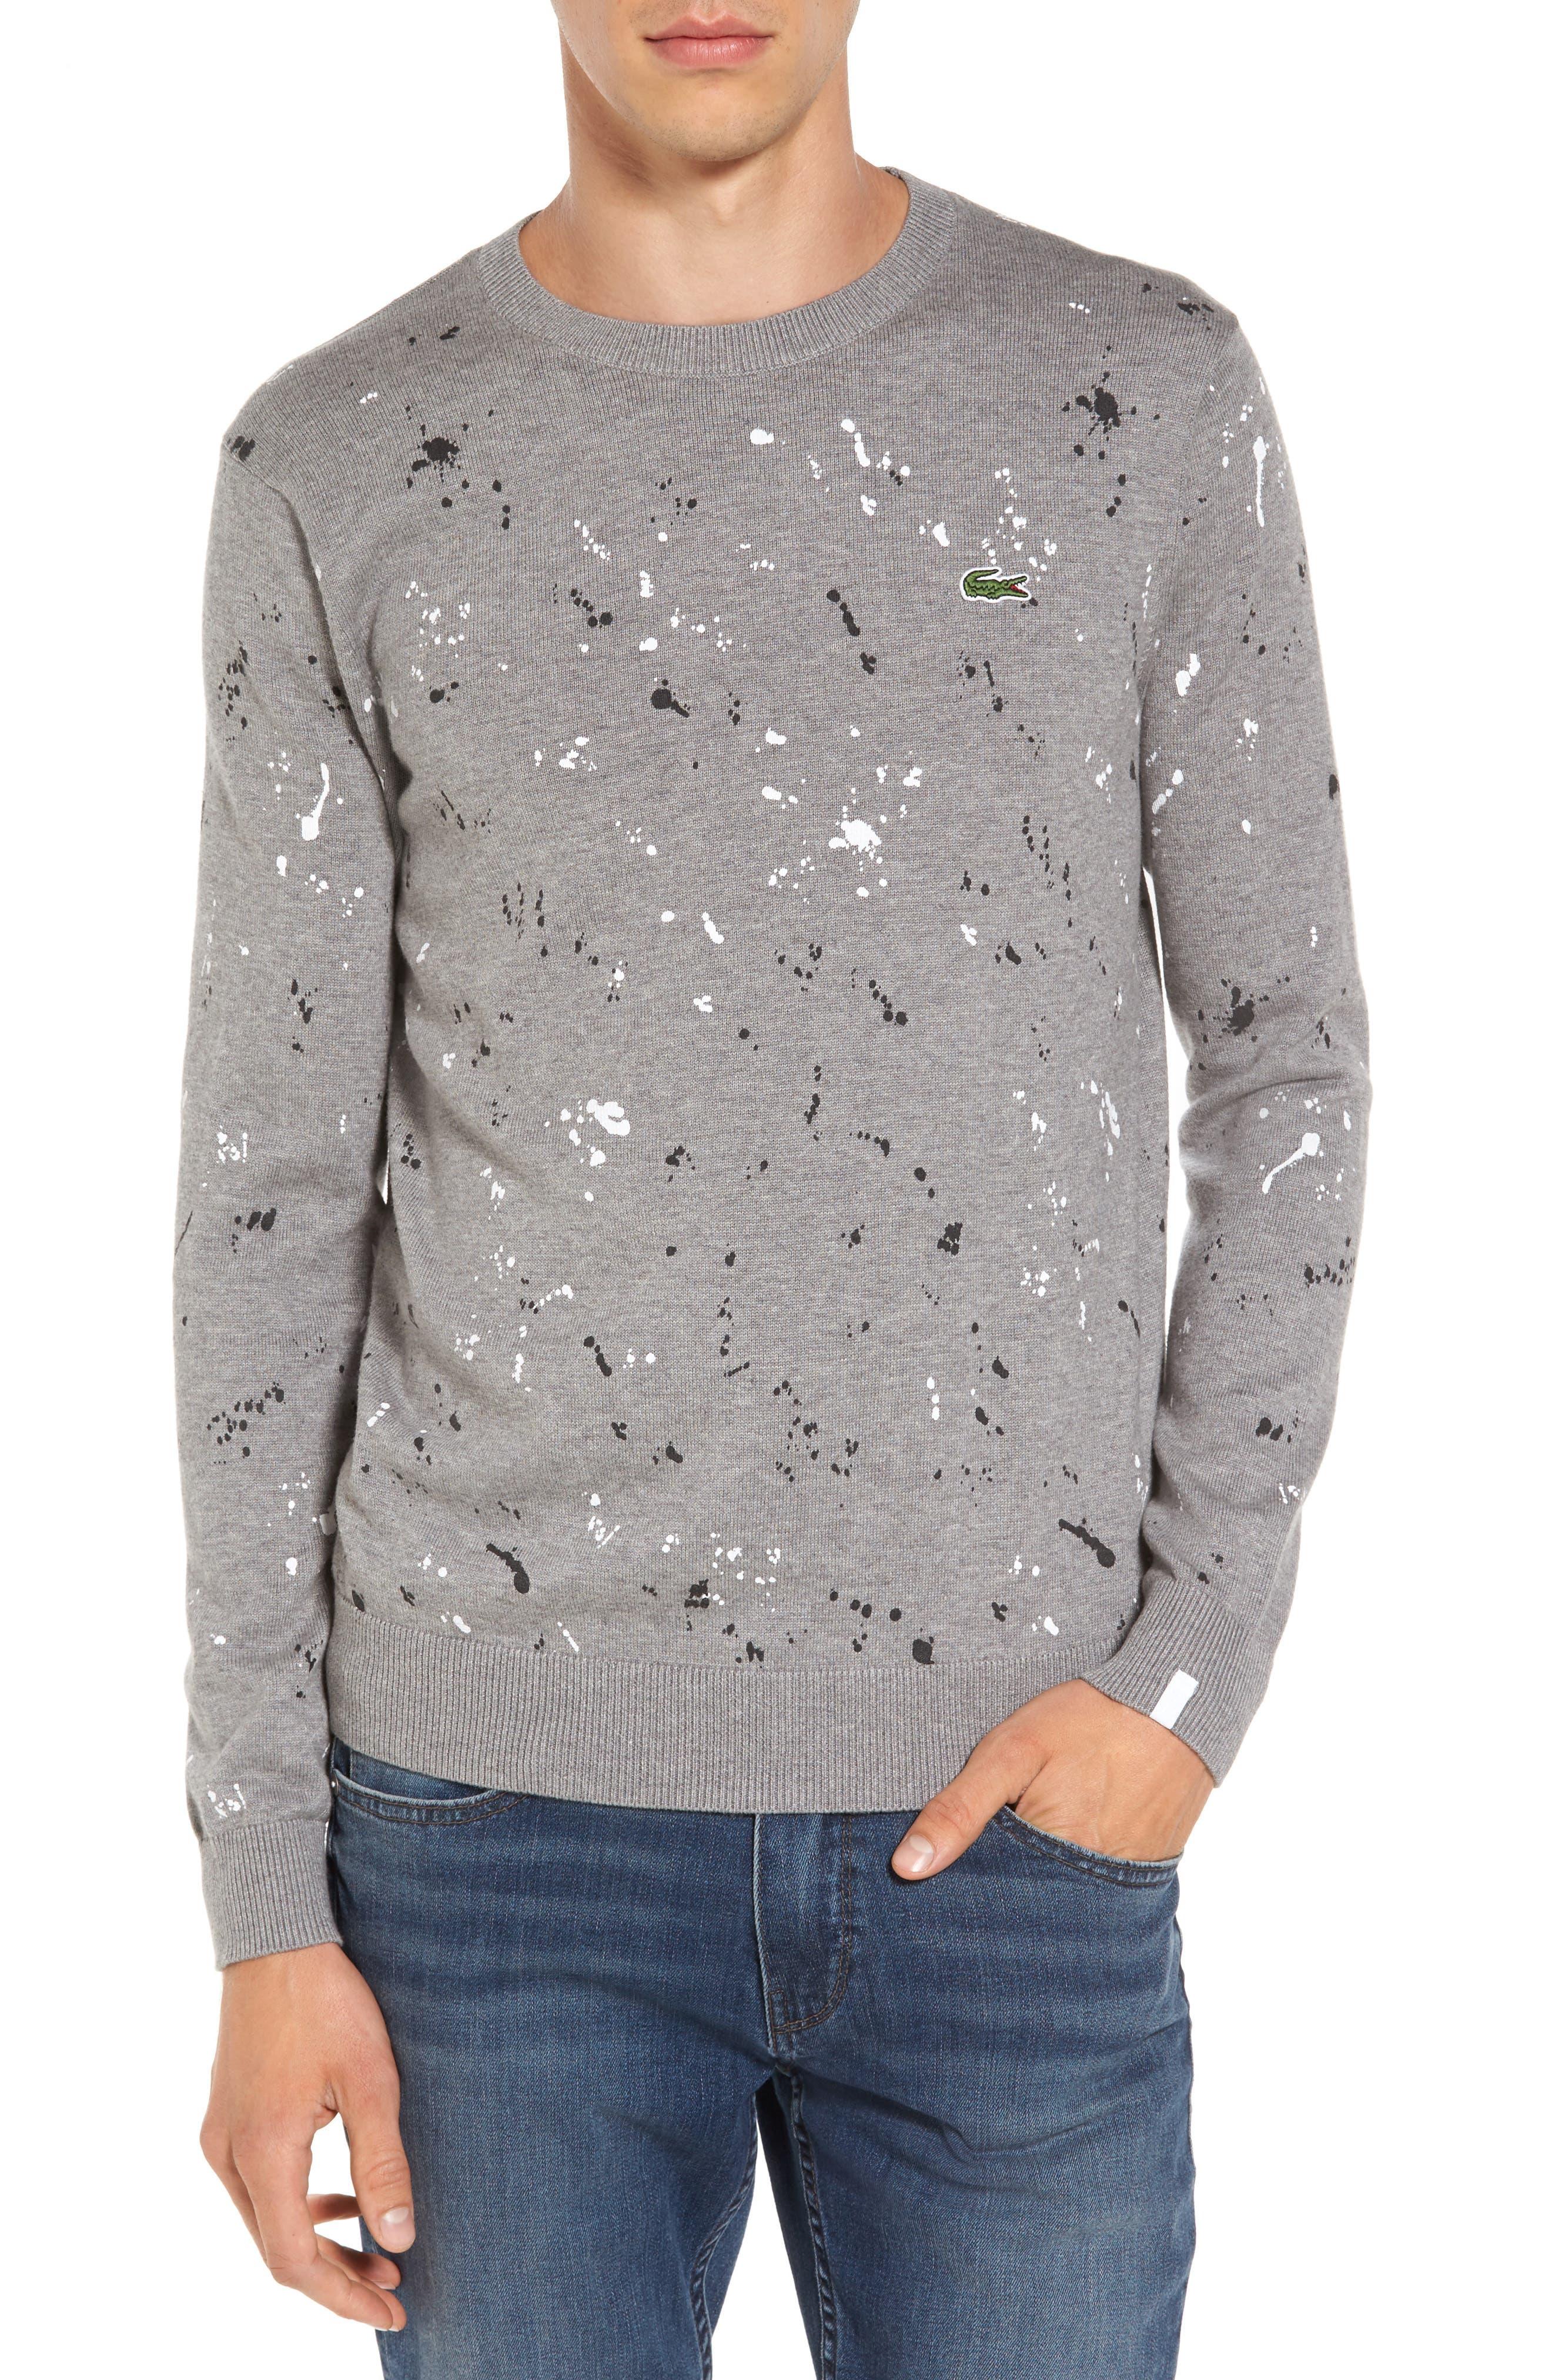 Splatter Sweater,                         Main,                         color, 062